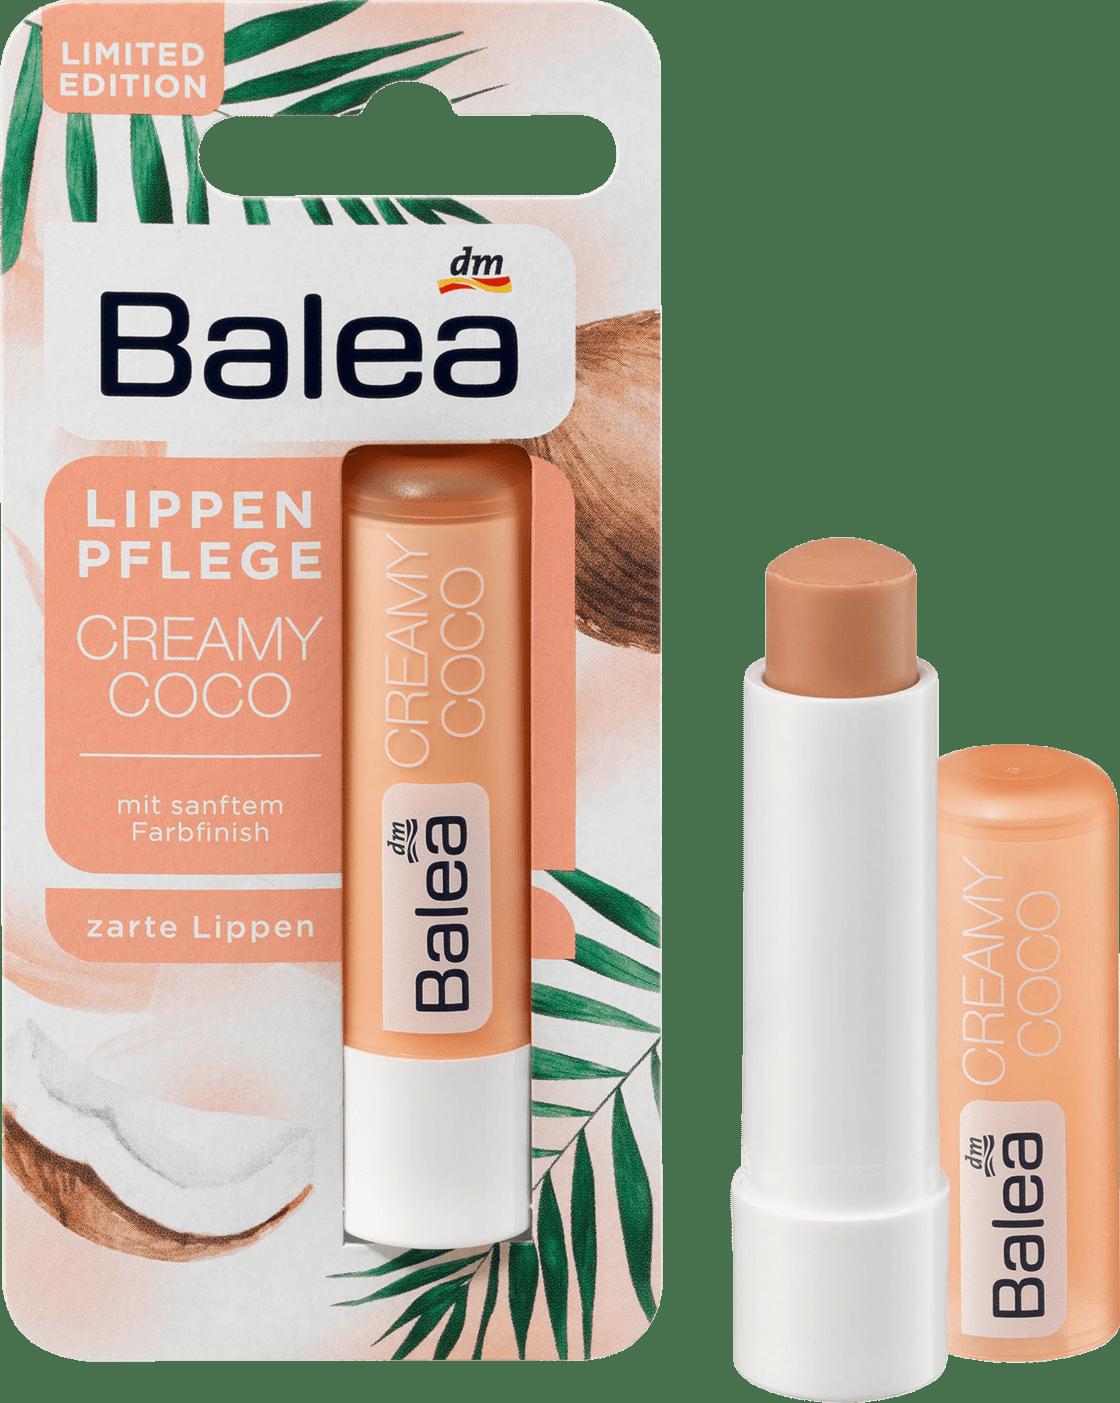 balea lippenpflege creamy coco, 4,8 g dauerhaft günstig